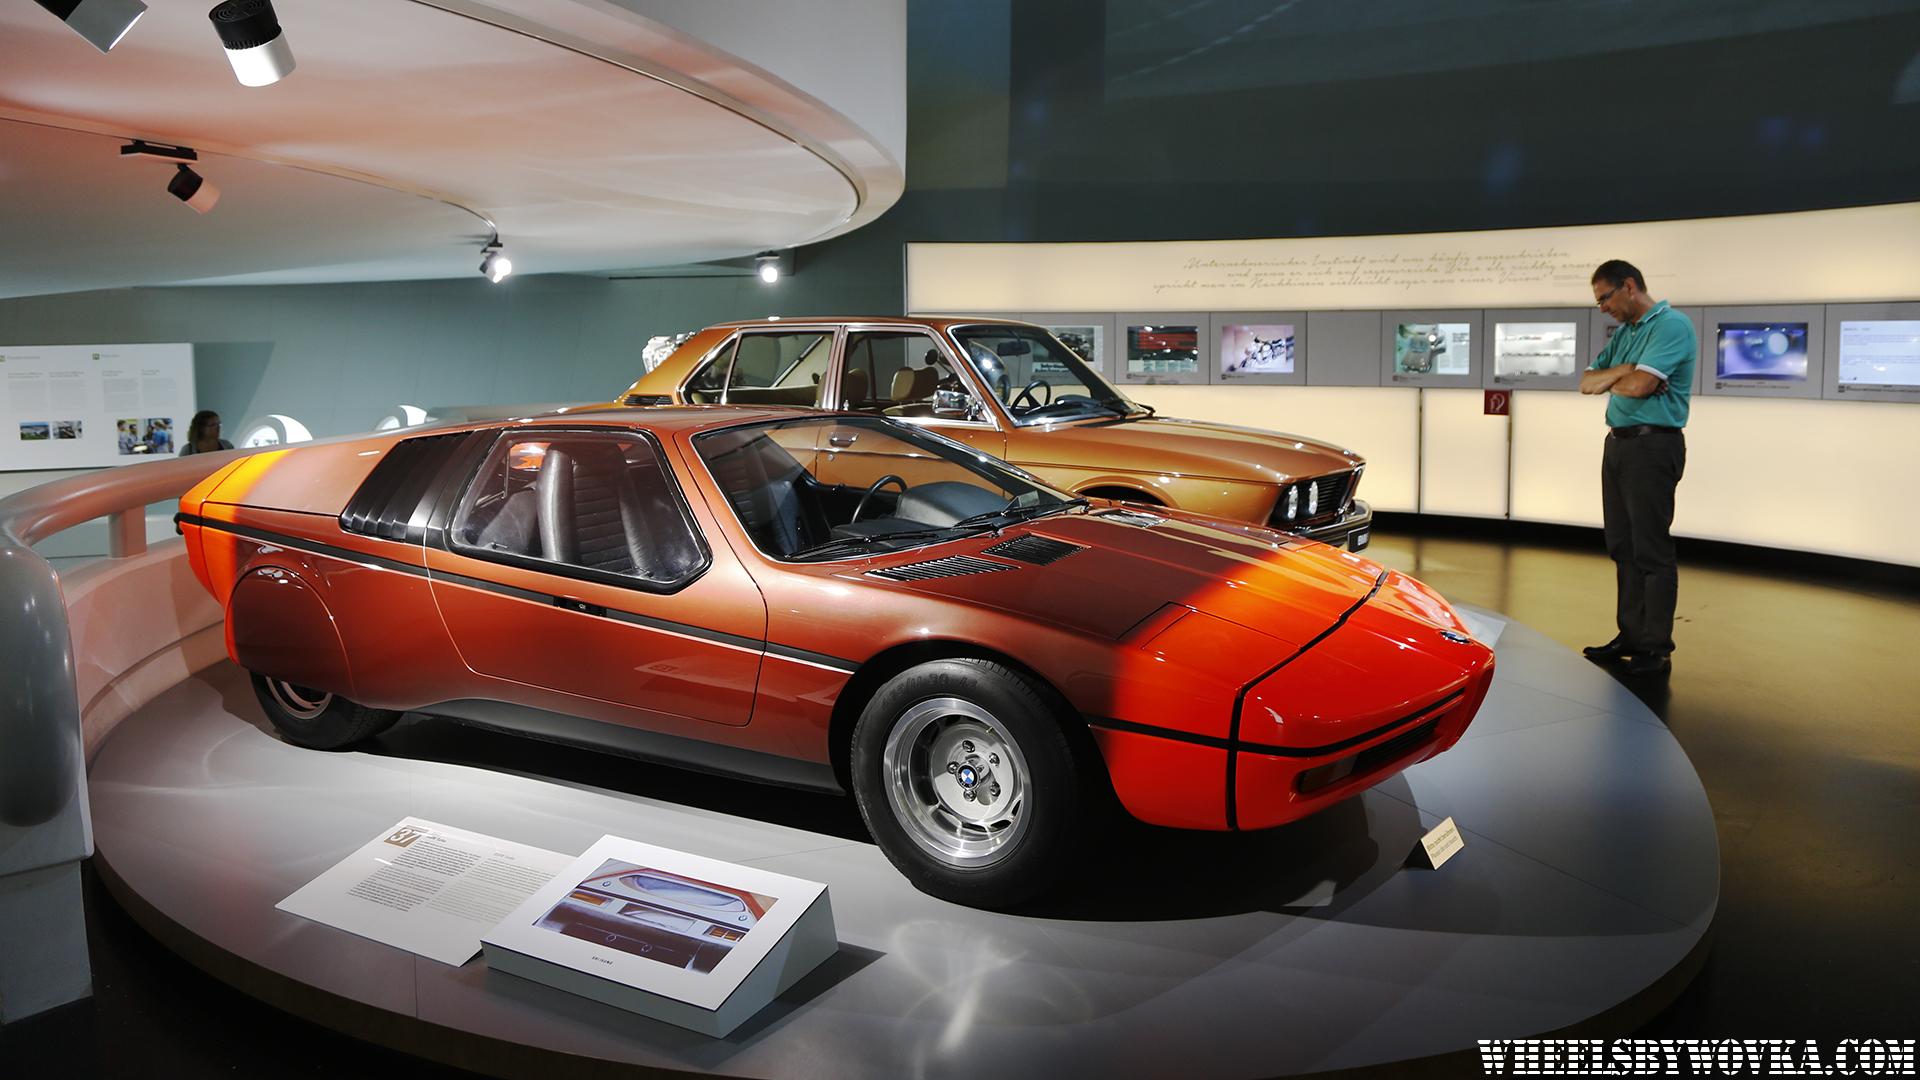 Bmw Museum Munich >> BMW Museum / Munich - WHEELSBYWOVKA